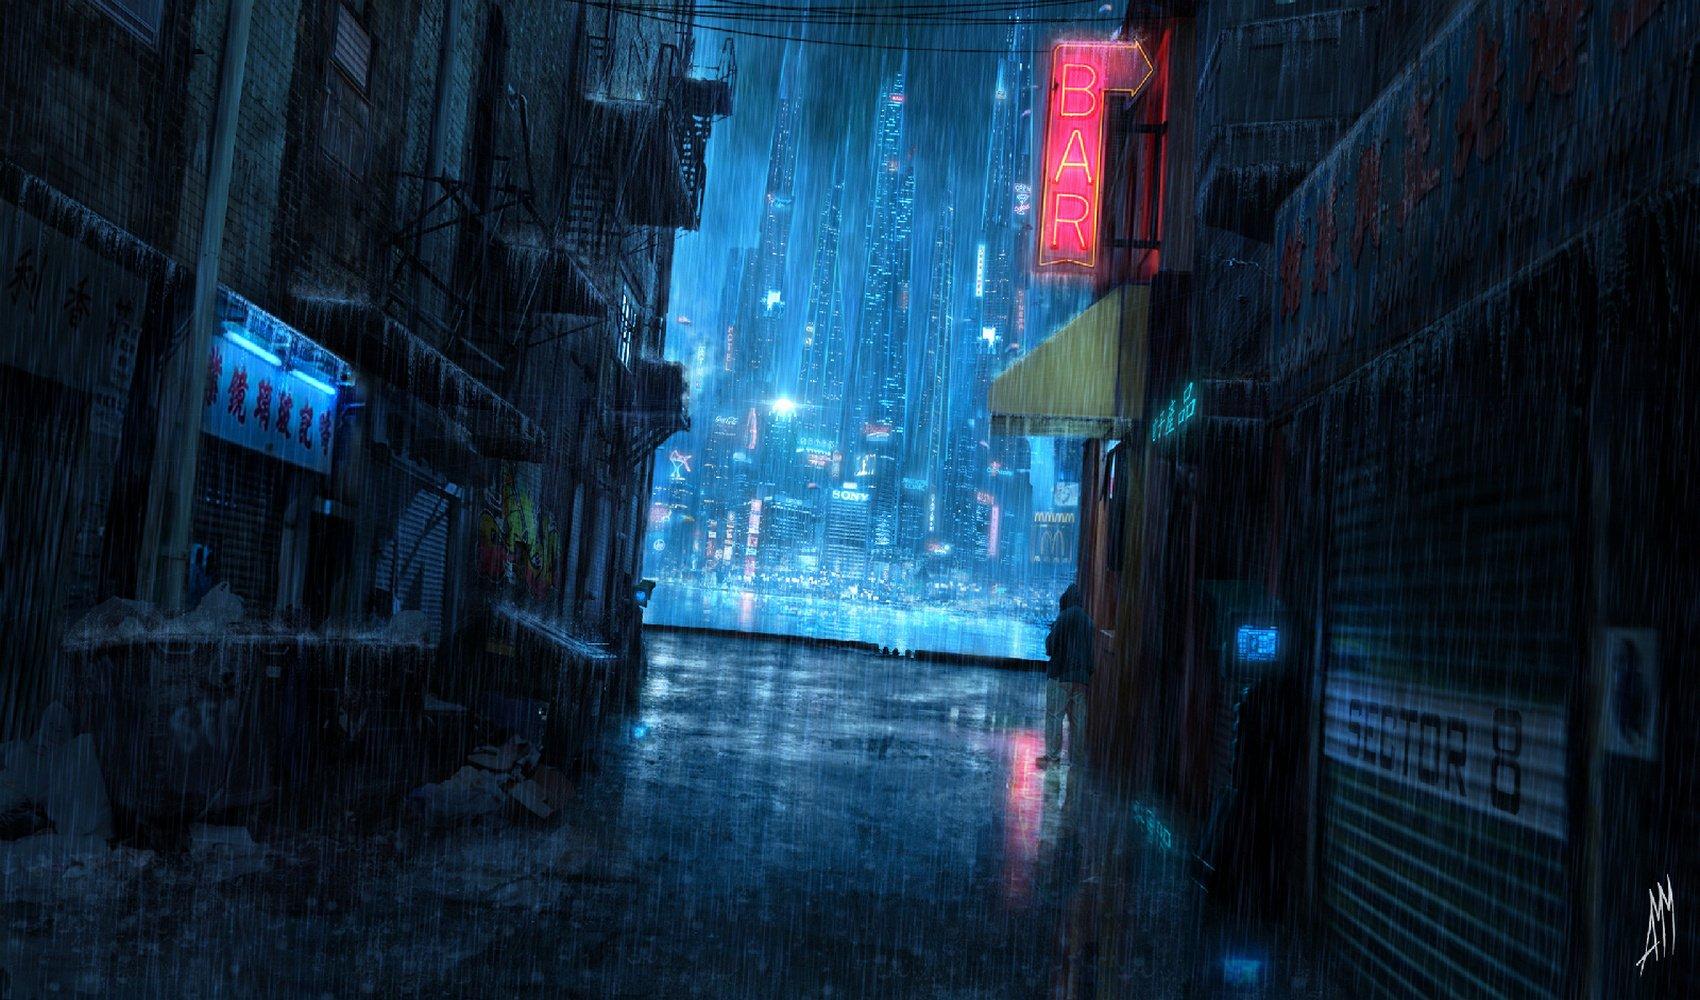 Rain city lights night future wallpaper | 1700x1000 ...